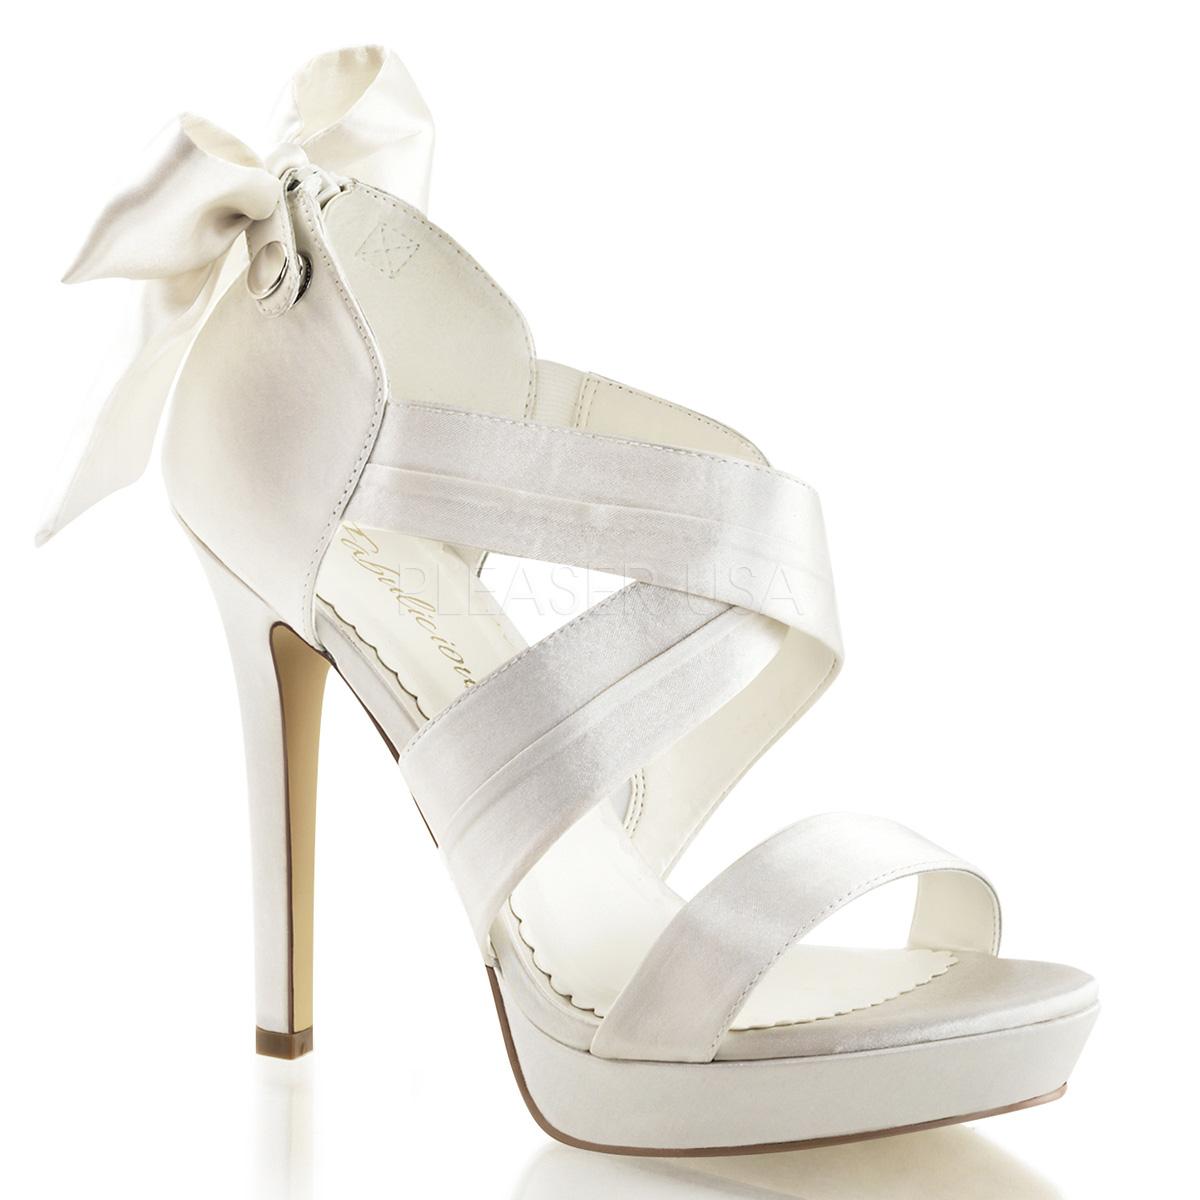 Sandale mariage satin ivoire - Pointure : 41